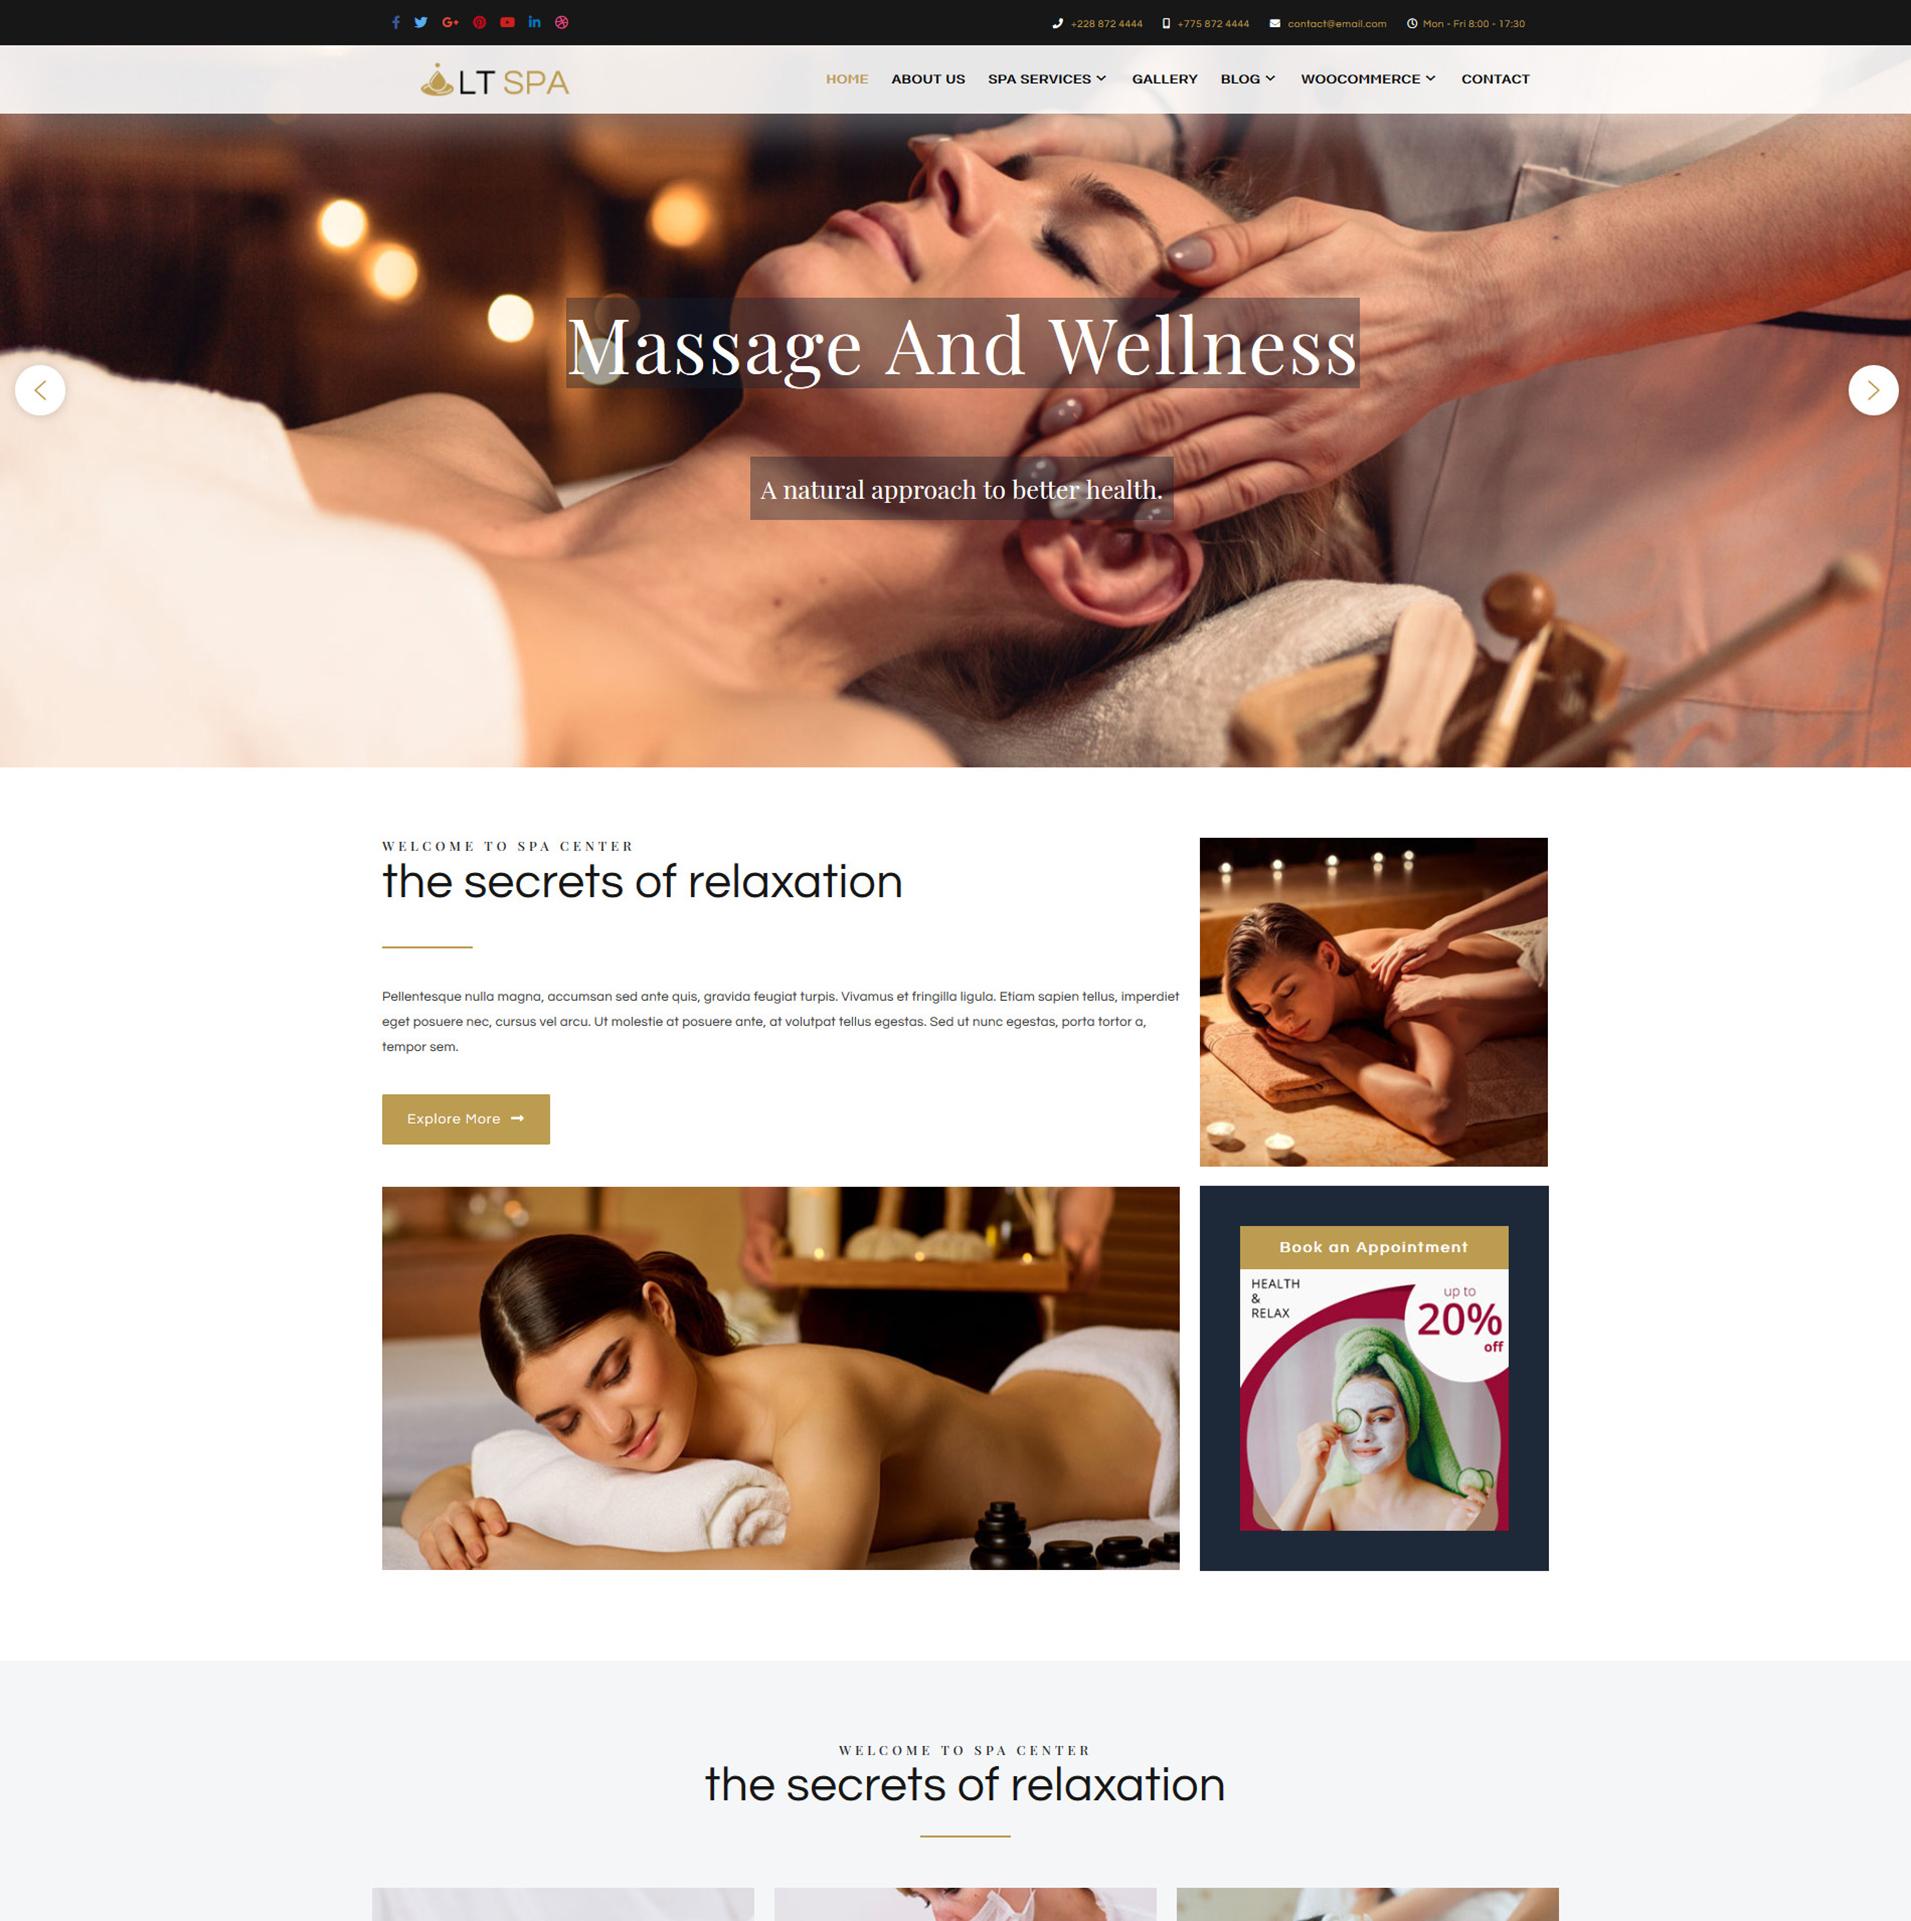 lt-spa-responsive-wordpress-theme